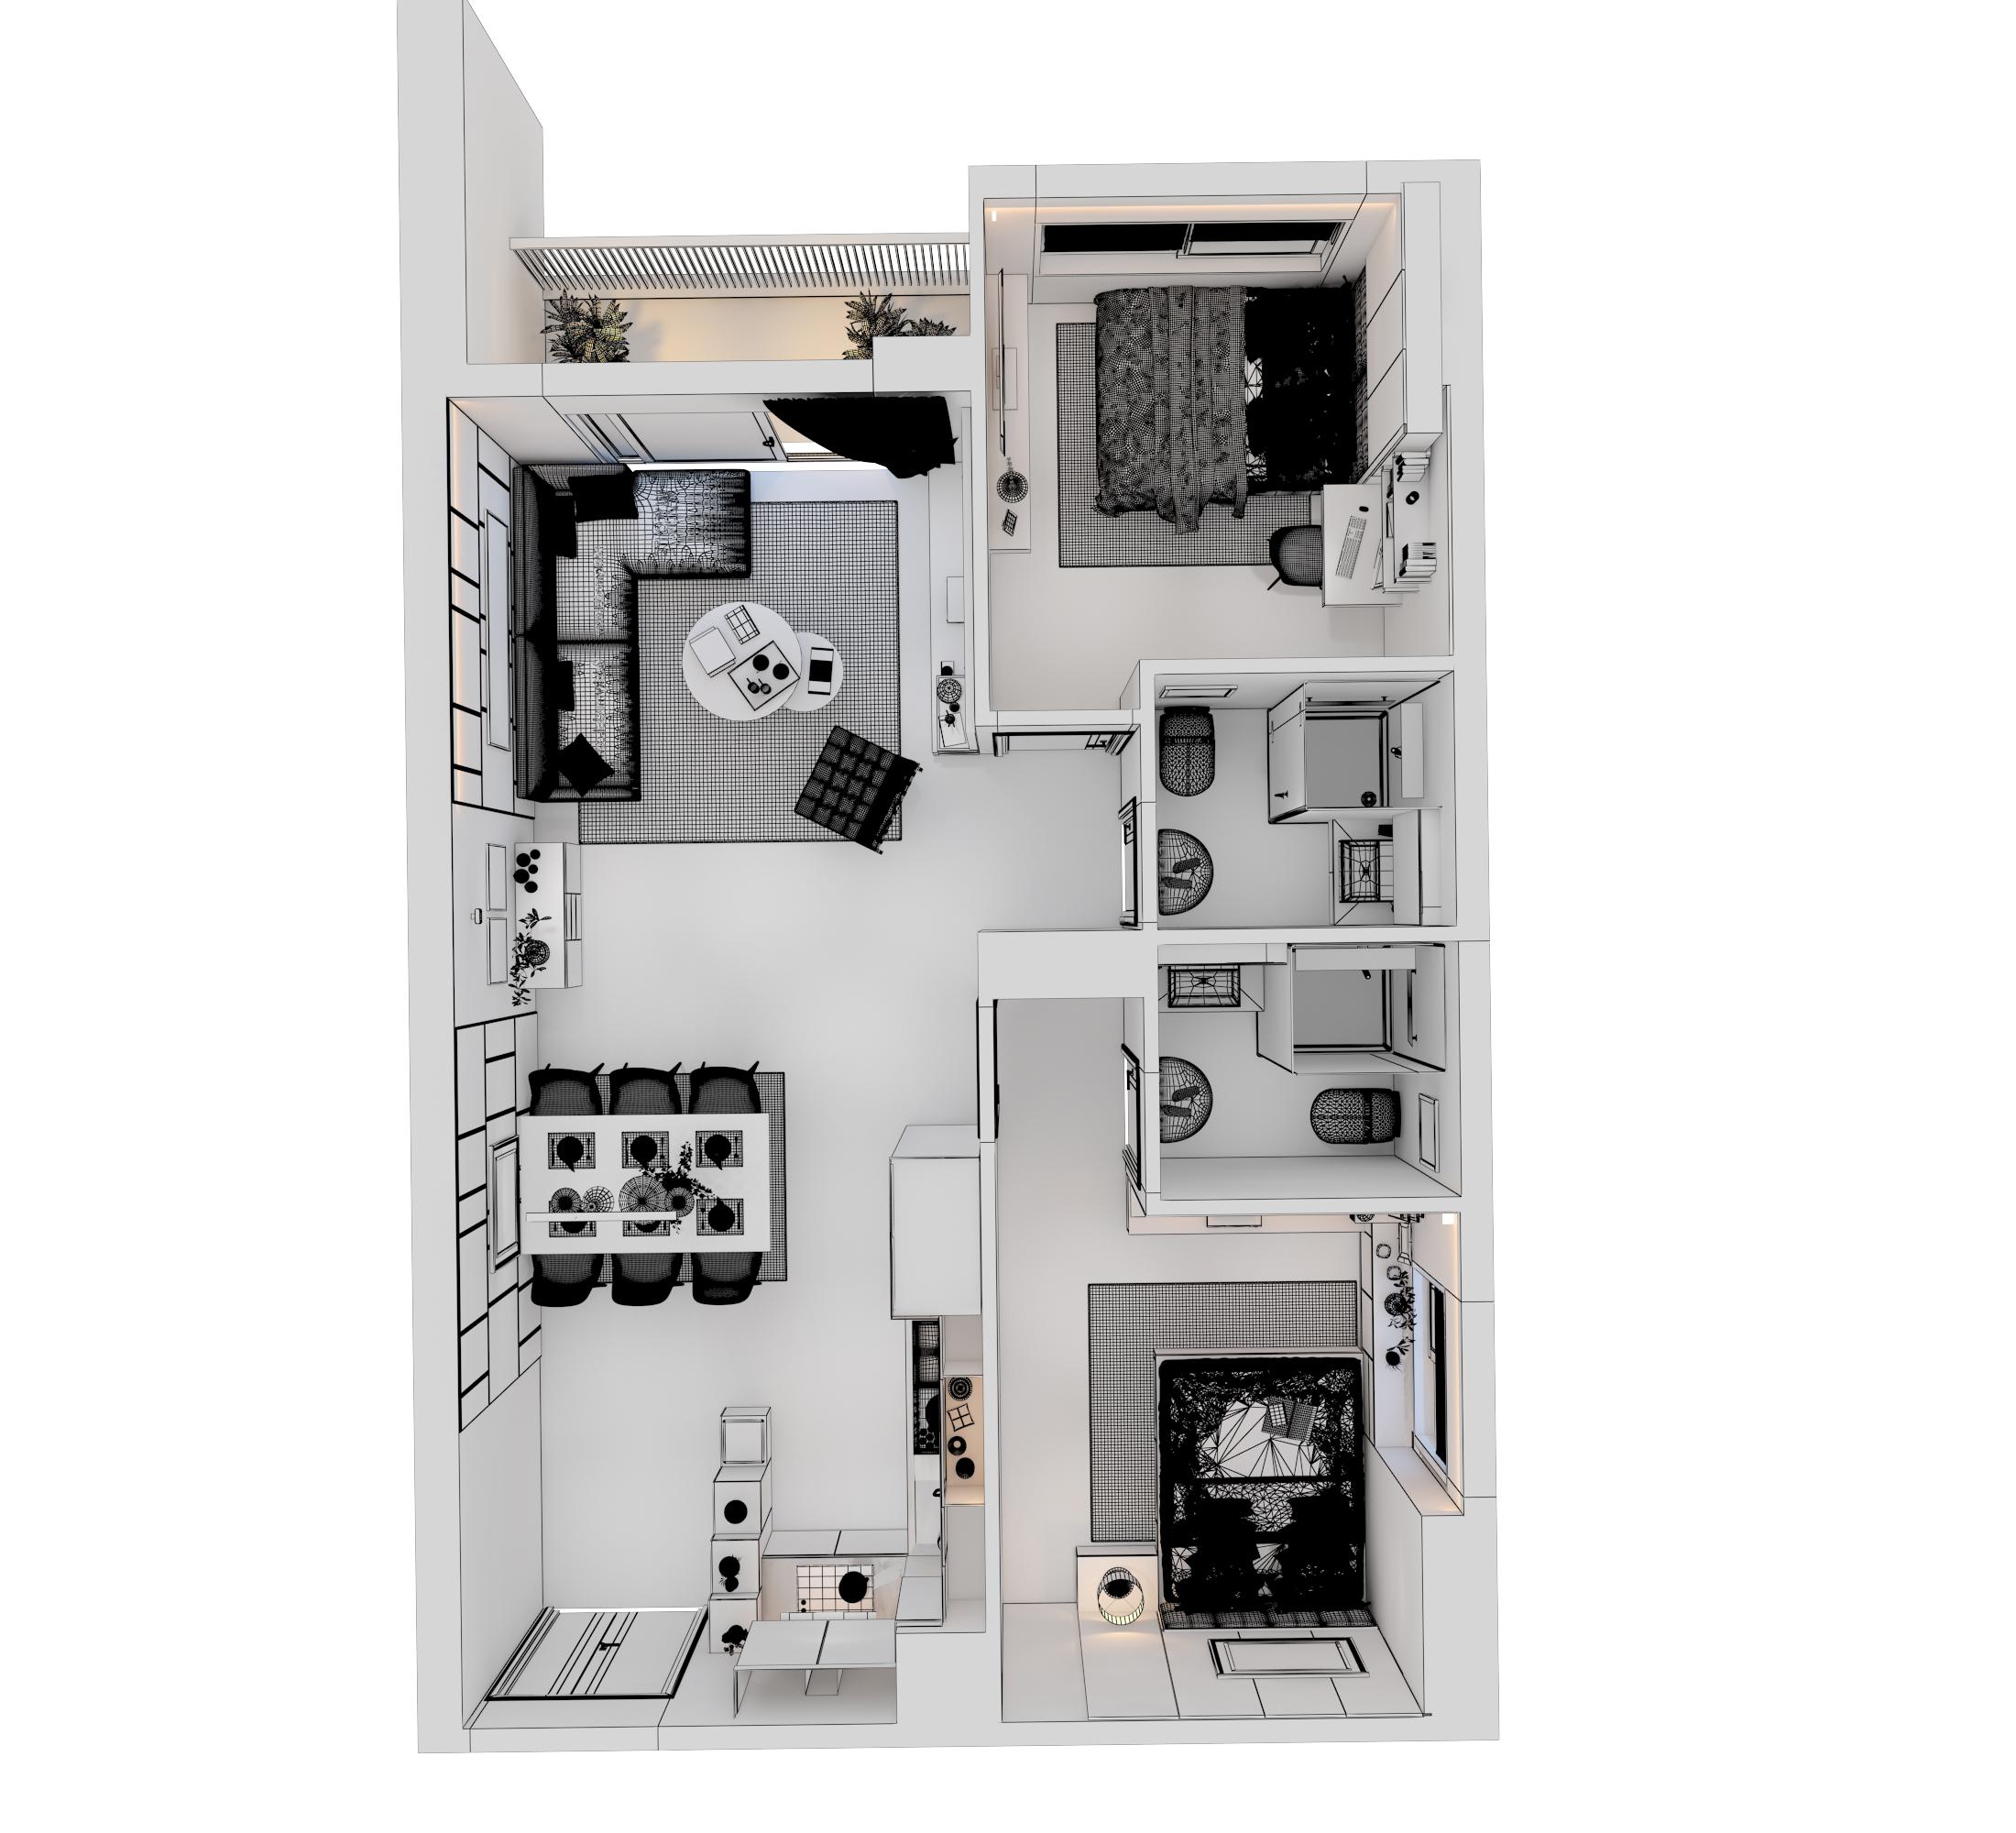 Cutaway apartment full furnitures modern design 3d model max 279965